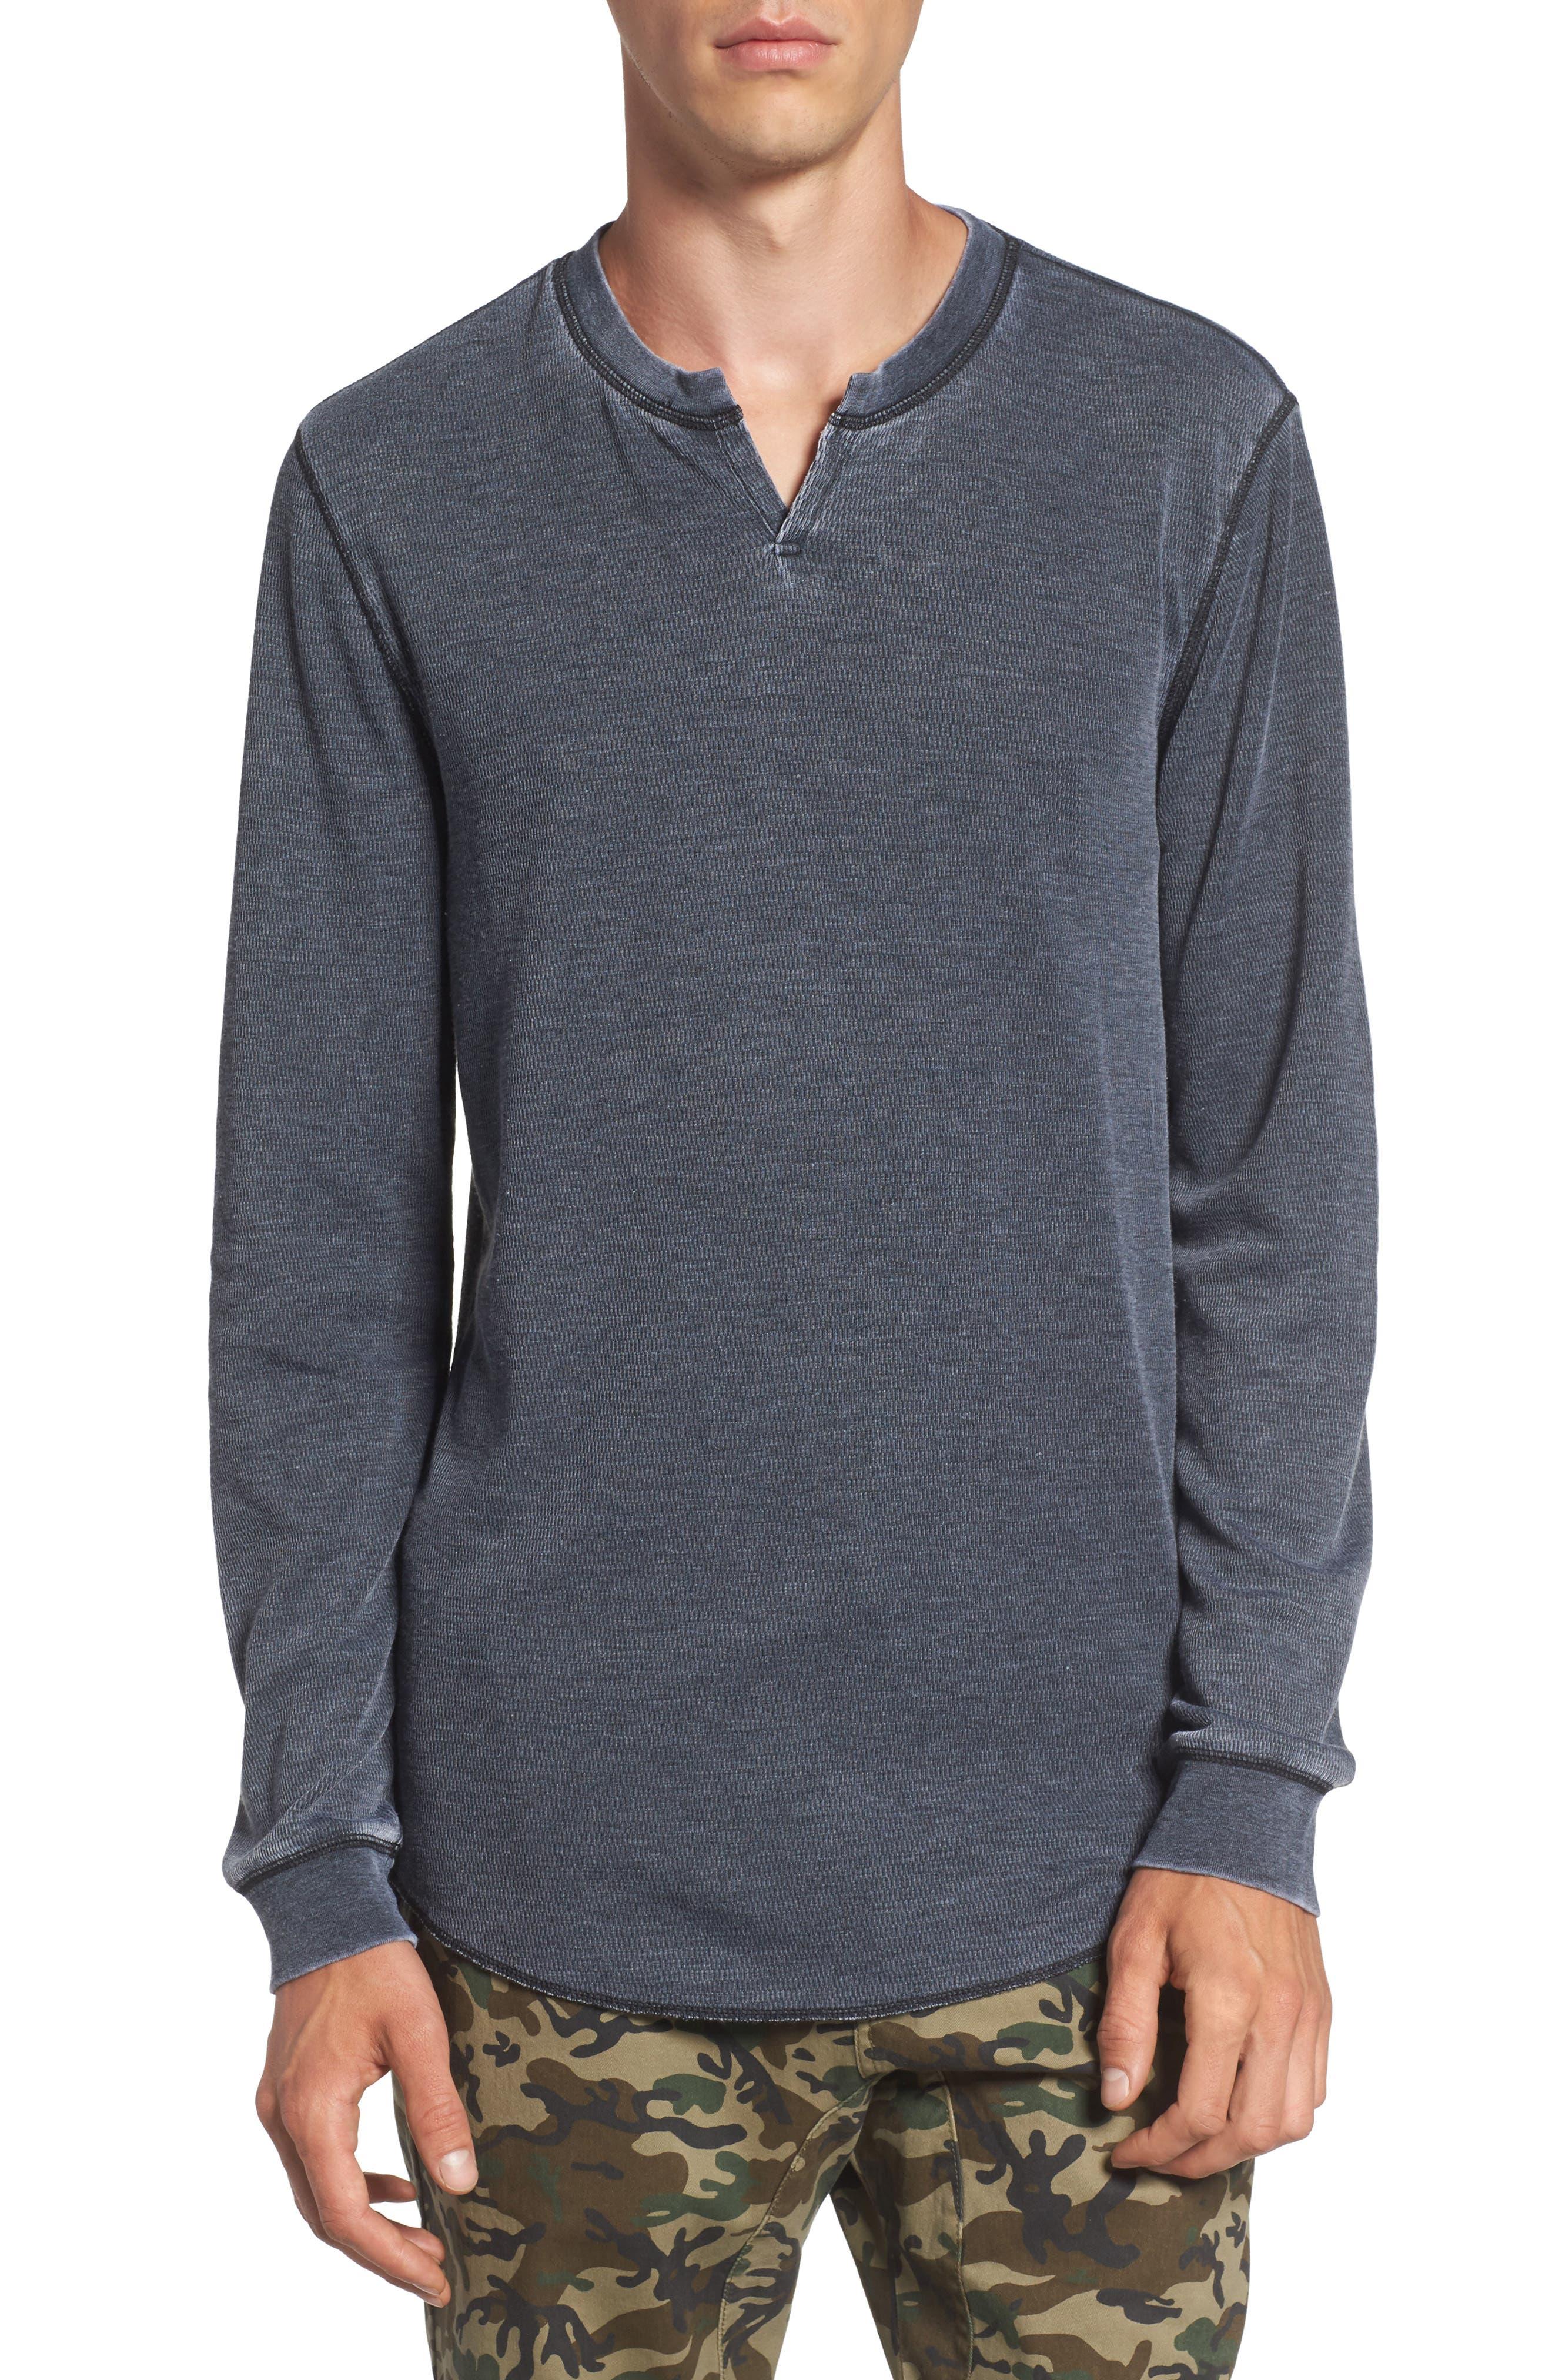 Notch Neck Thermal T-Shirt,                             Main thumbnail 1, color,                             Black/ White Burnout